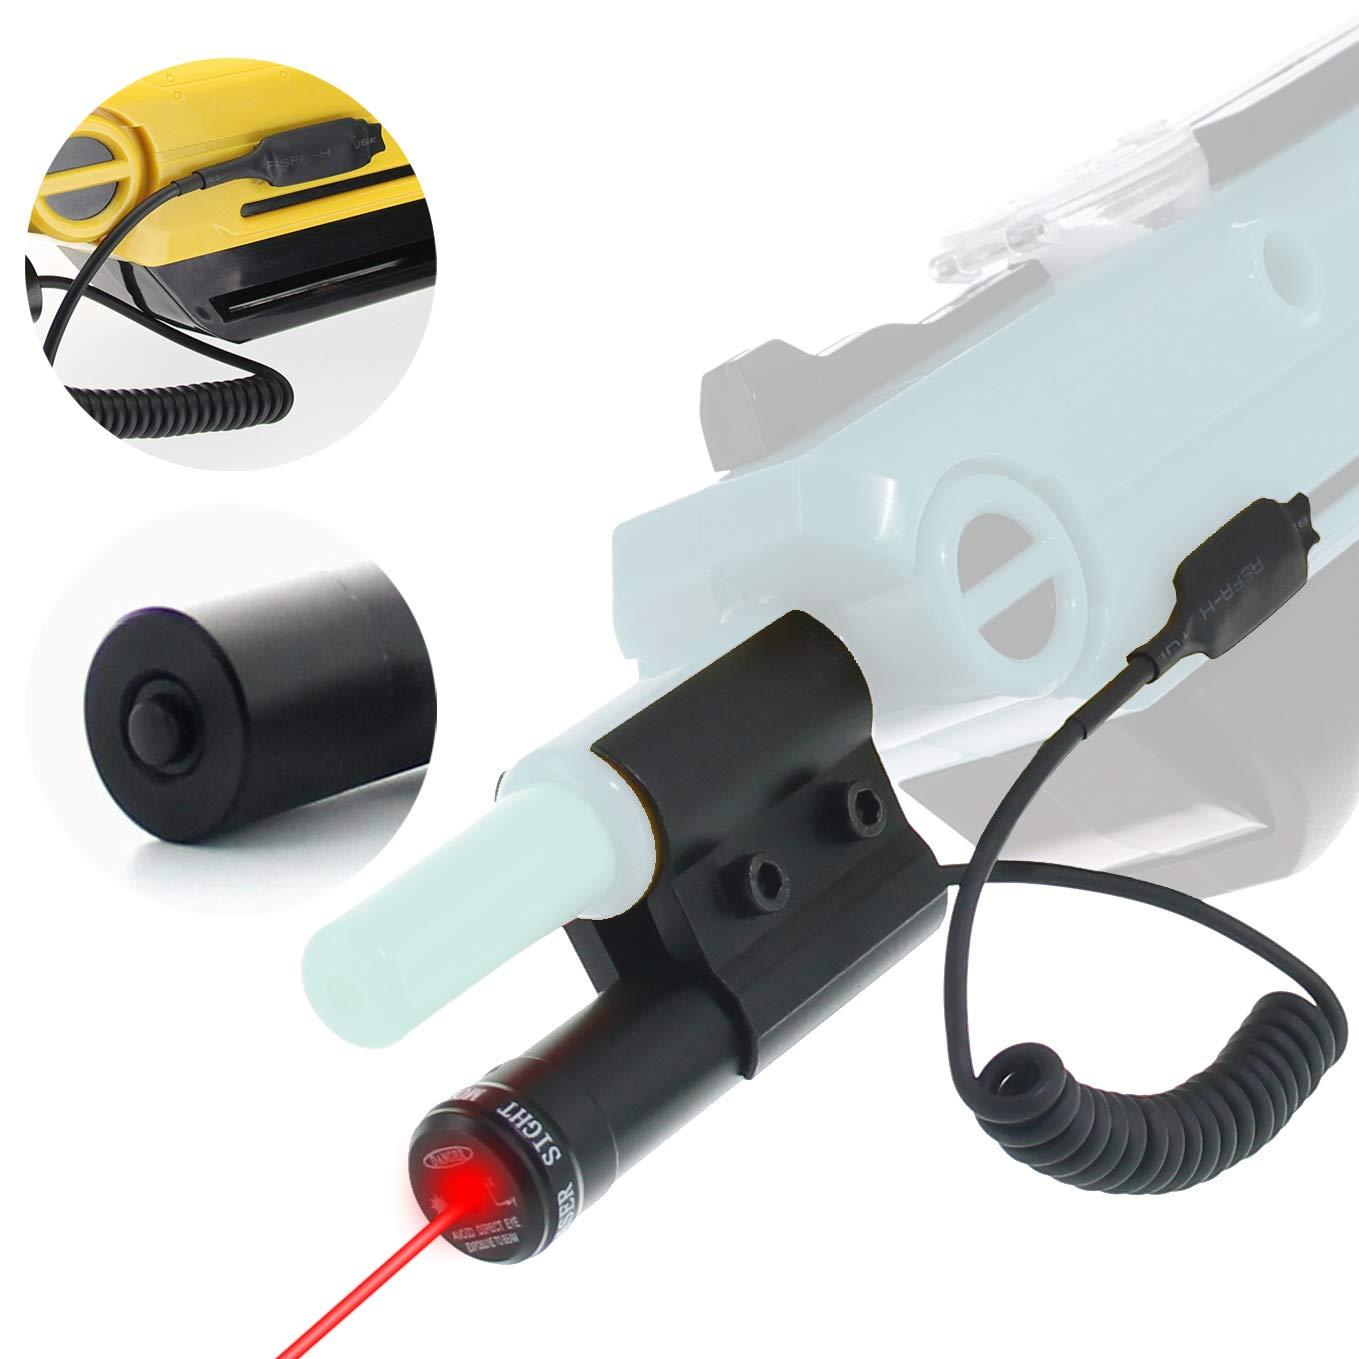 AUROLUXE Bug A Salt Gun 2.0 Laser Sight Beam with Pressure Switch | Bug & A Fly Salt Gun Accessory | Aiming Scope Shotgun Fit All Fly Shotgun Edition Add-On | Lawn & Garden Insect Eradication